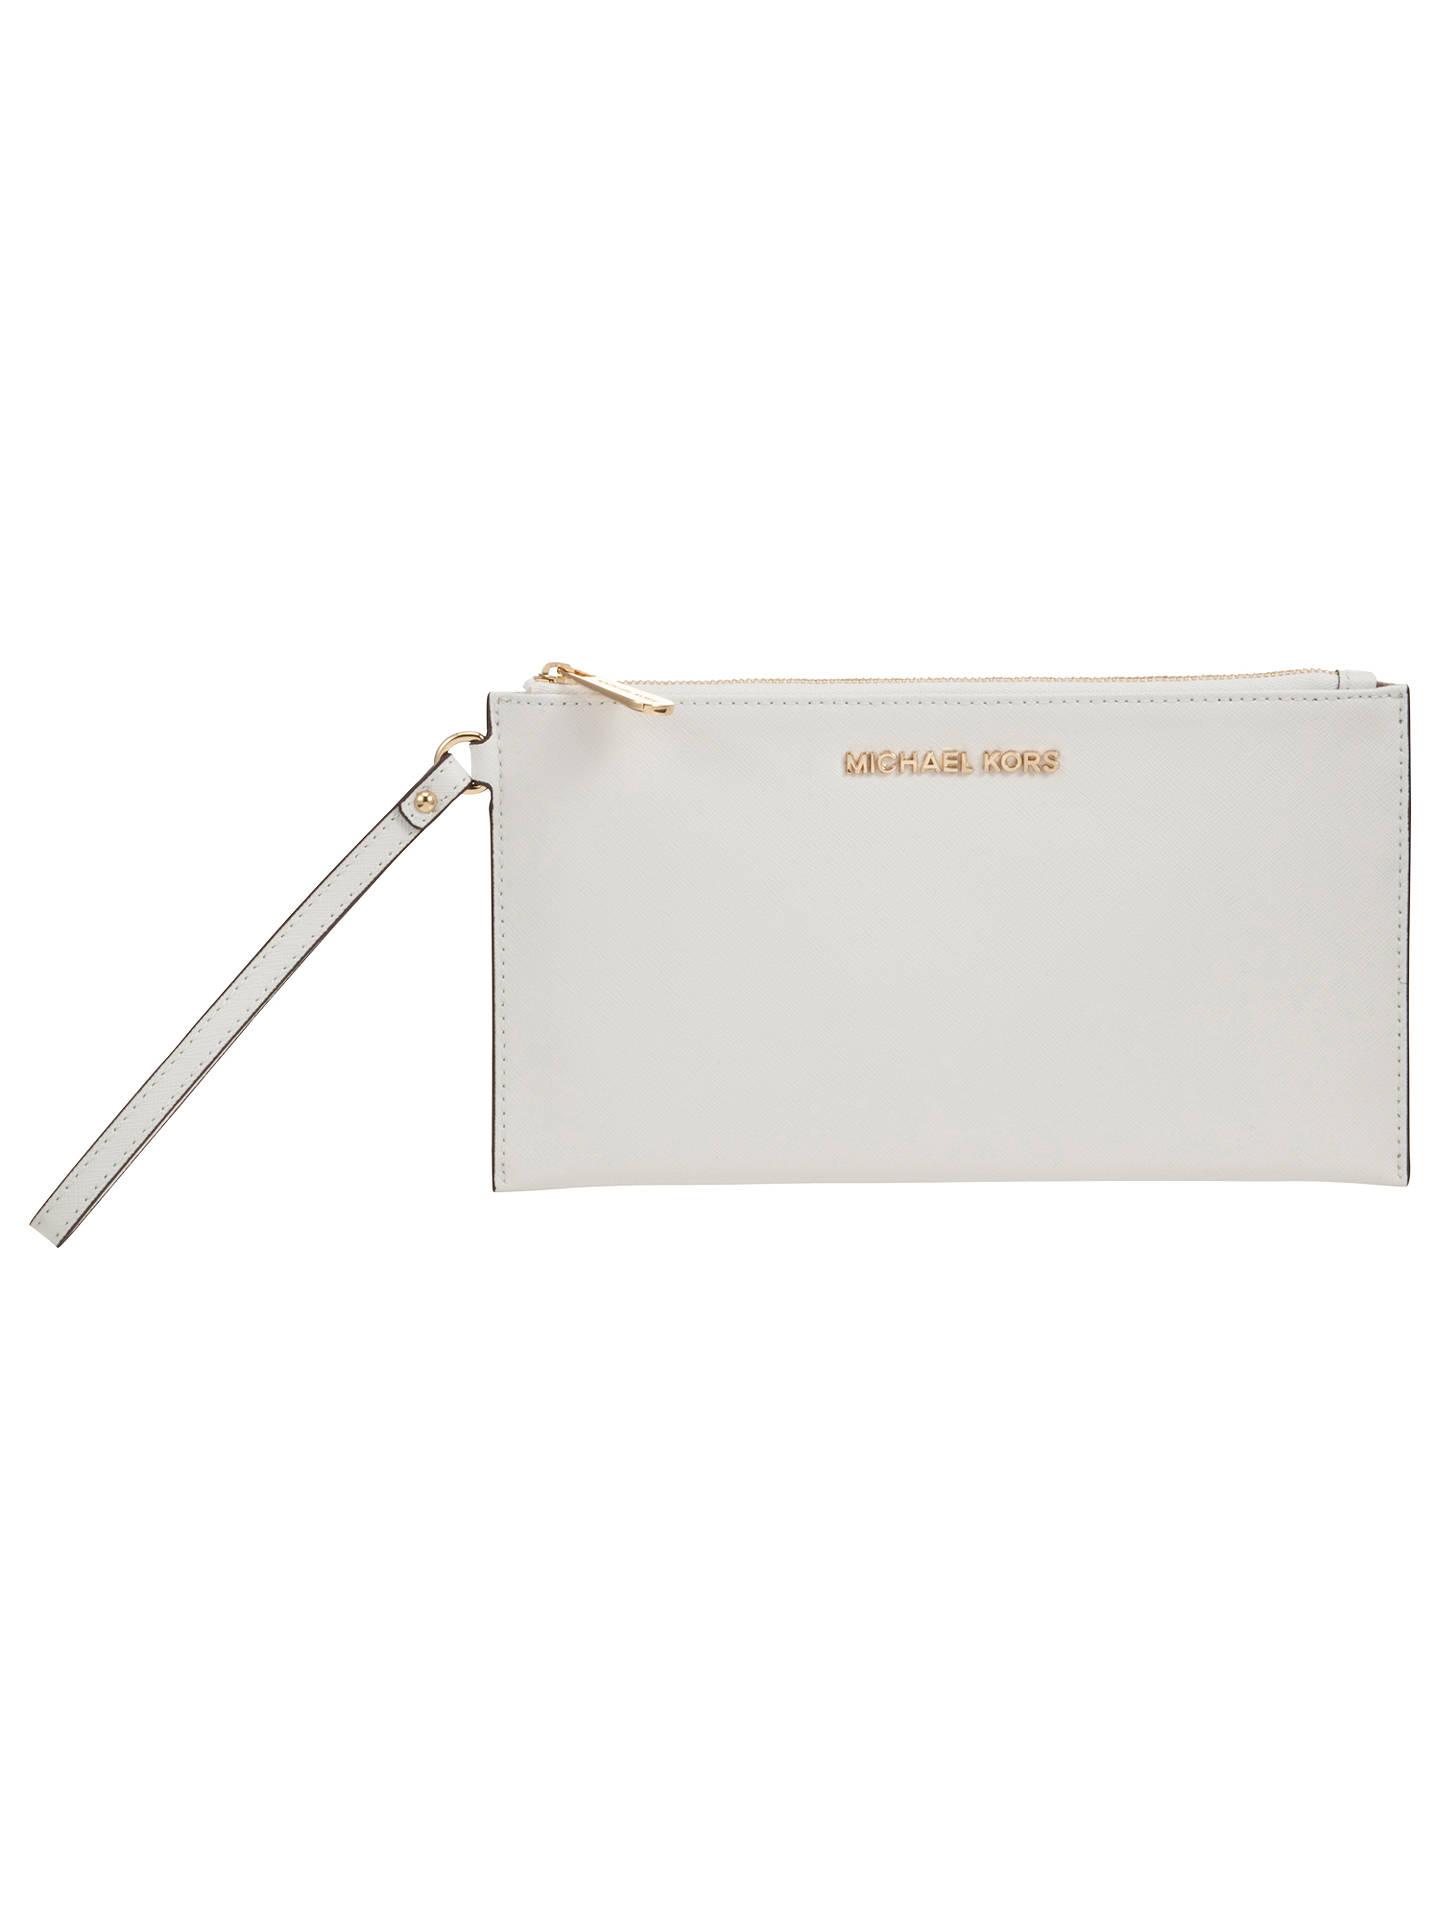 6549c961a8a0 Buy MICHAEL Michael Kors Jet Set Travel Zip Leather Clutch Bag, White  Online at johnlewis ...